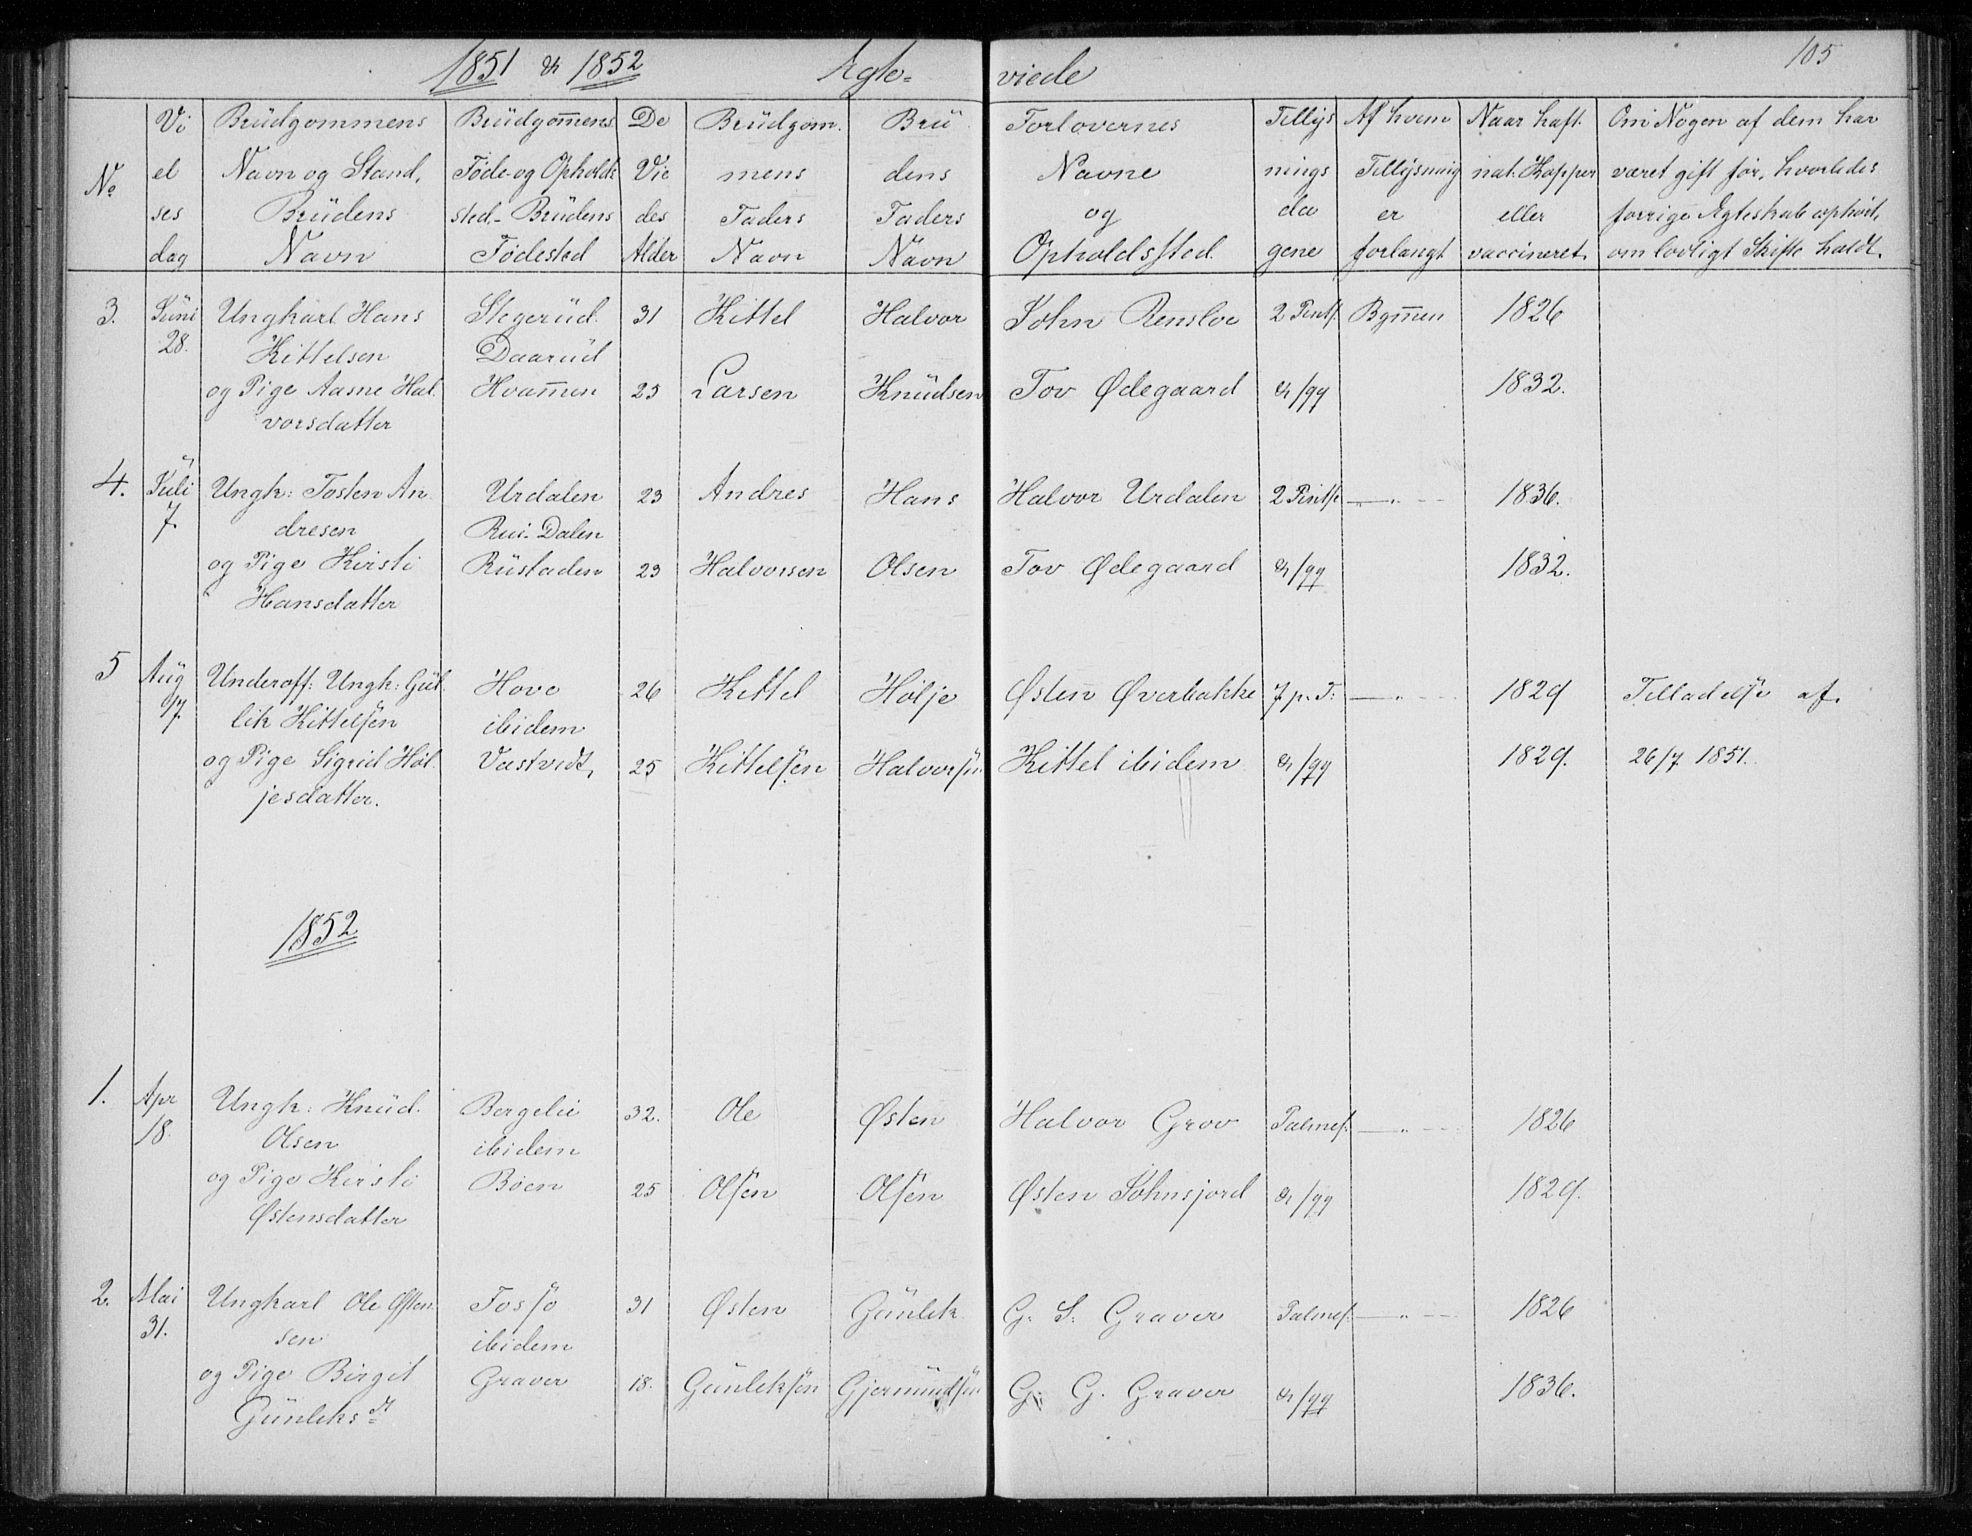 SAKO, Gransherad kirkebøker, F/Fb/L0003: Ministerialbok nr. II 3, 1844-1859, s. 105